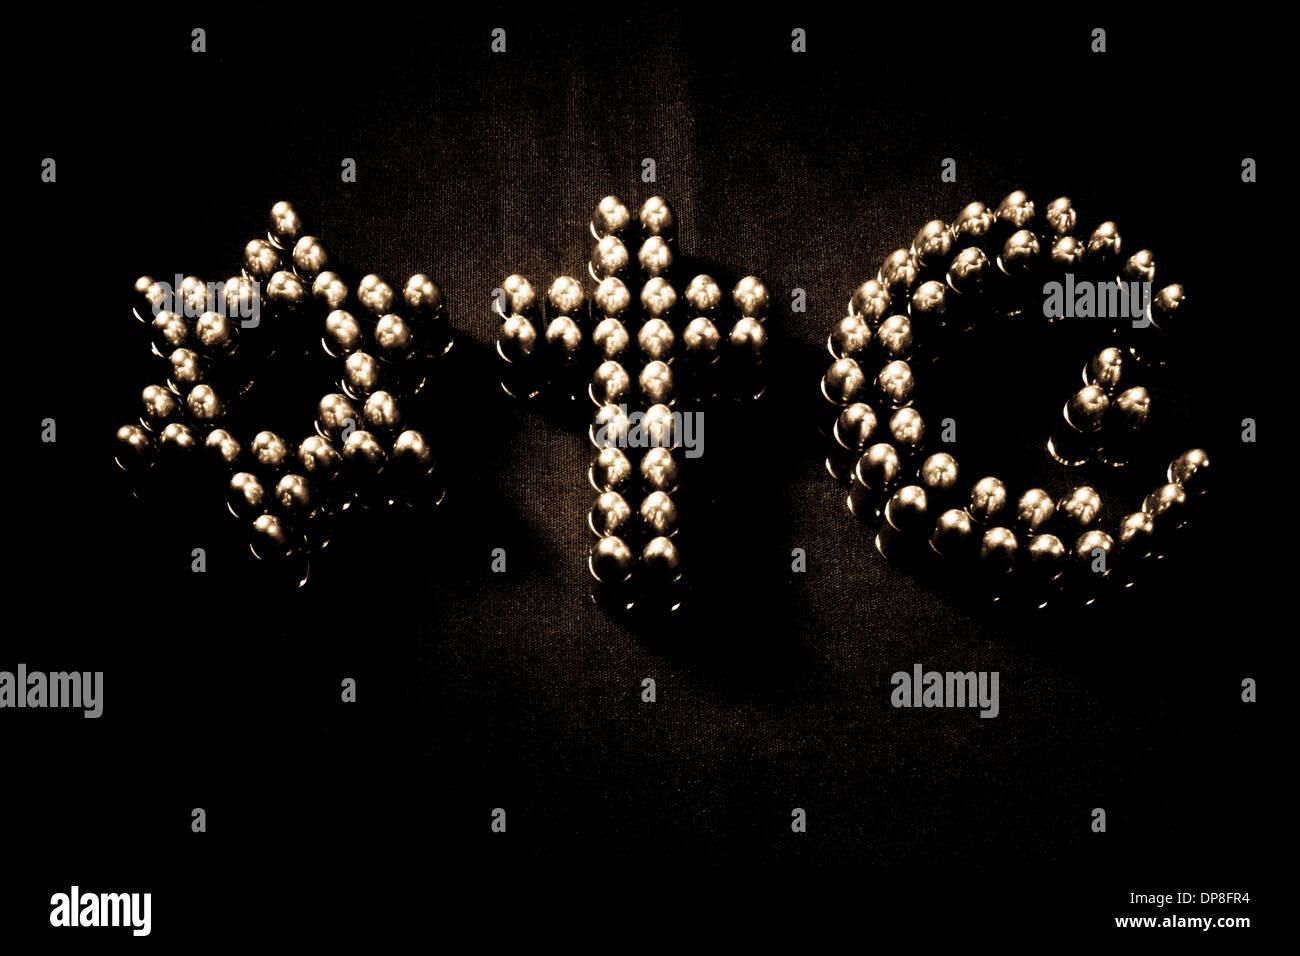 Symbols Of Abrahamic Cults Stock Photo Royalty Free Image